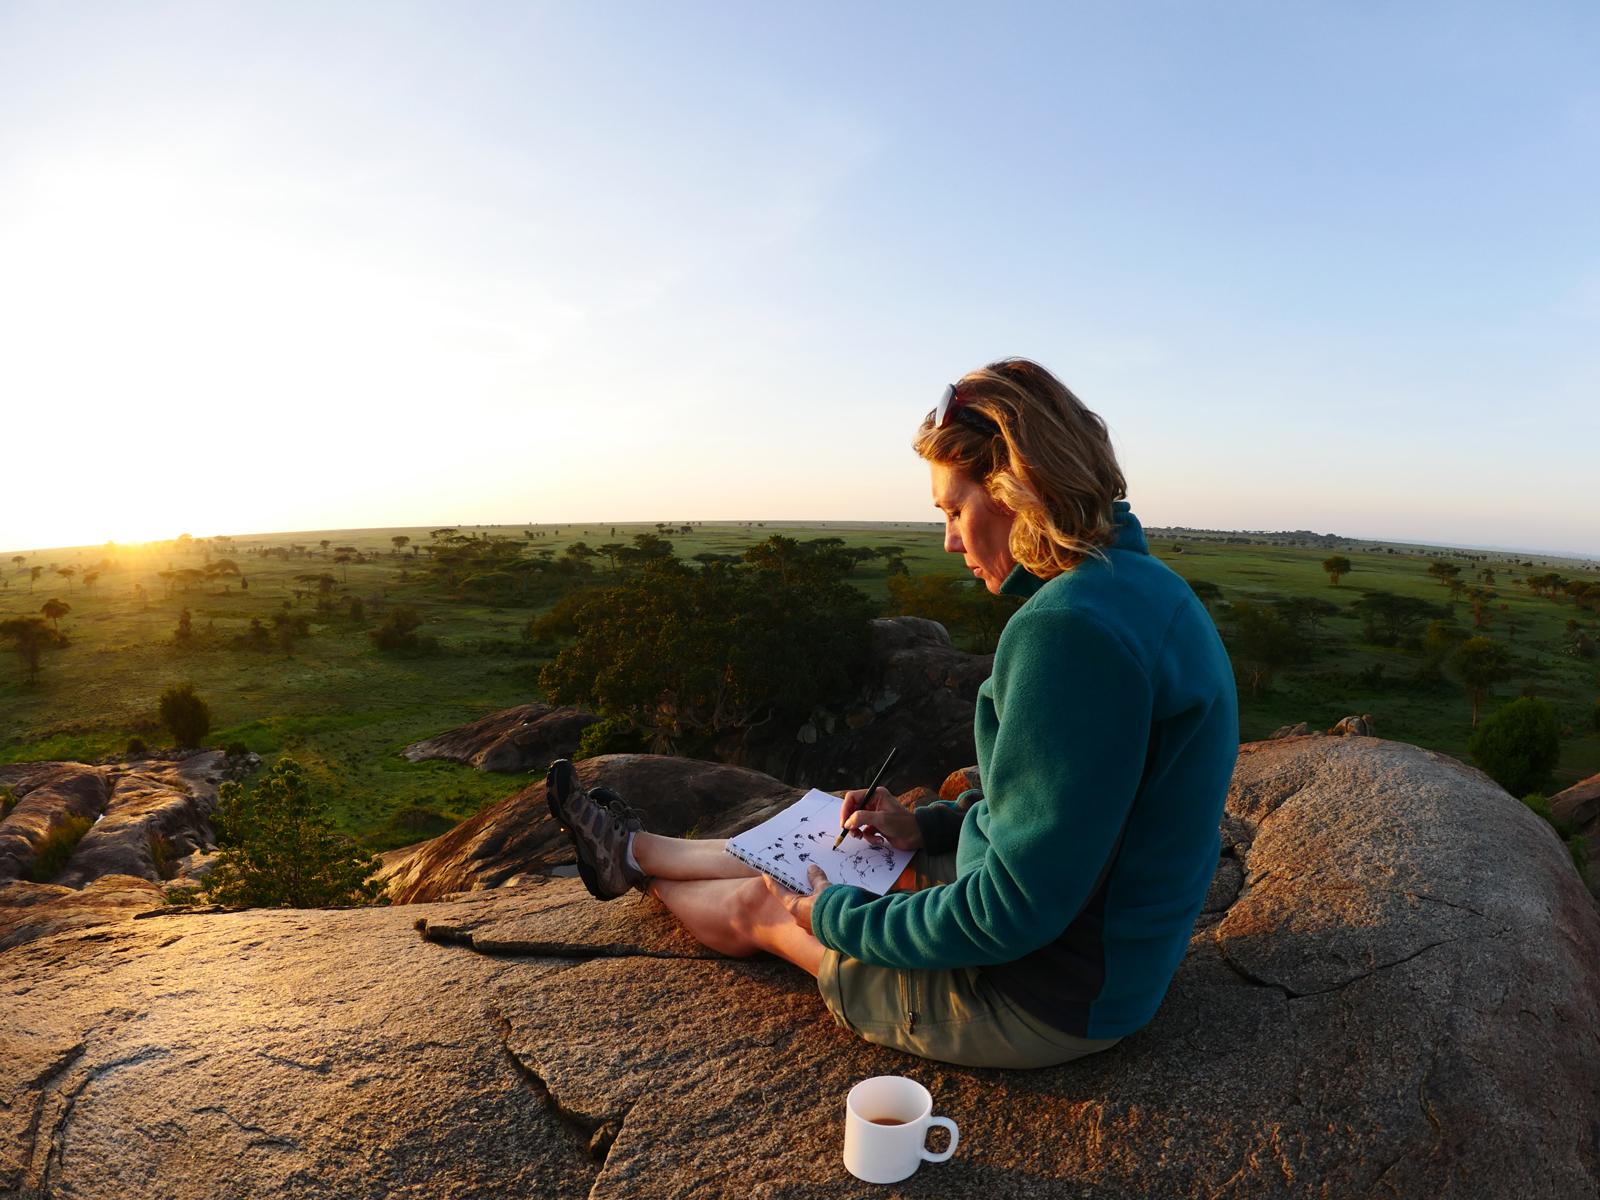 Woman sitting on rock drawing, Serengeti